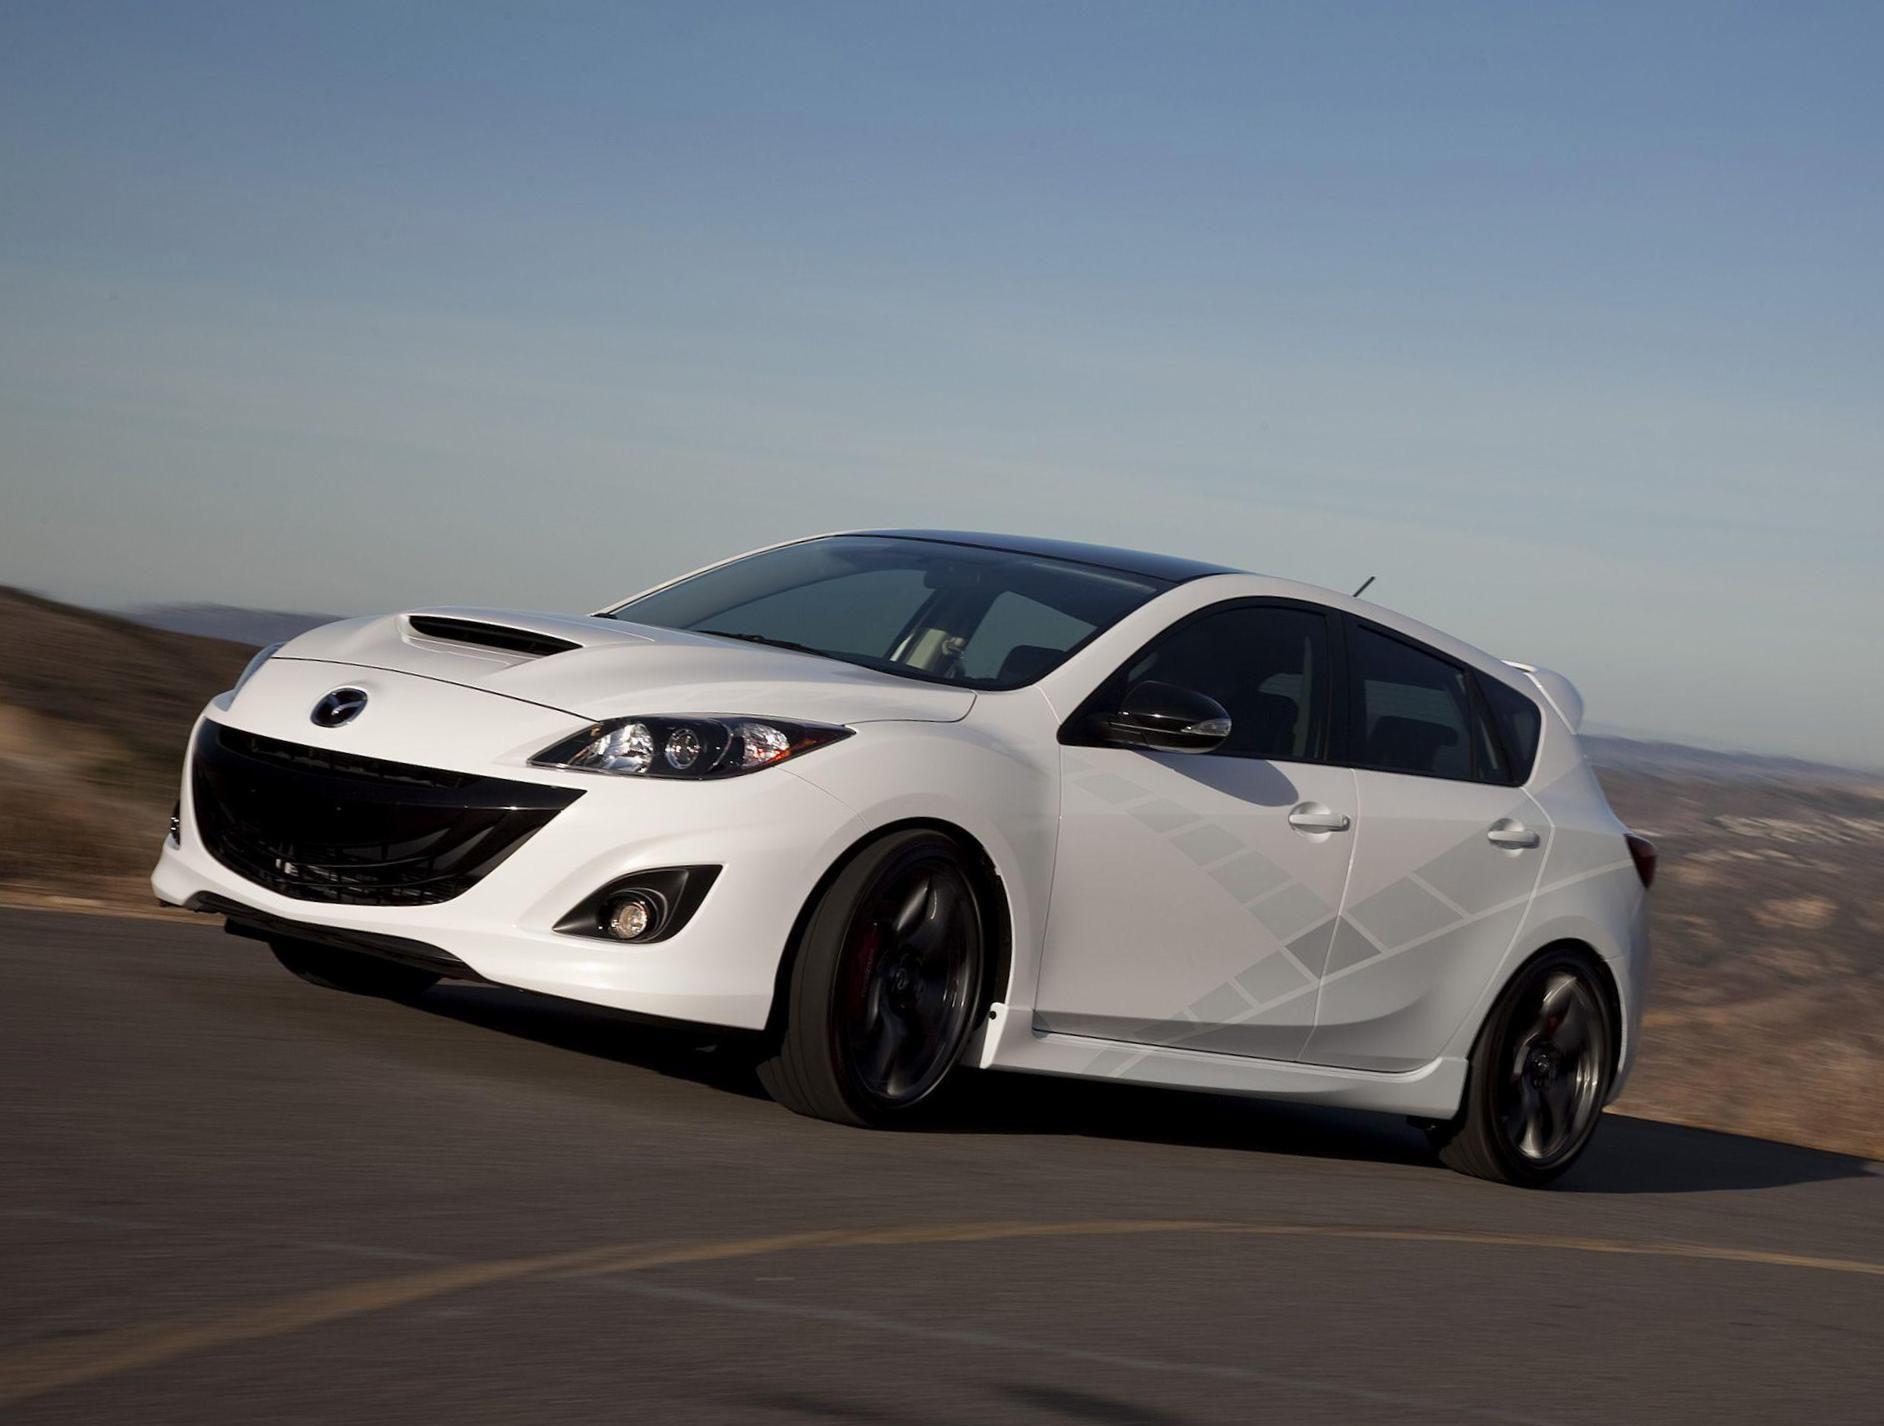 Lovely 2010 Mazdaspeed I Am In Love.